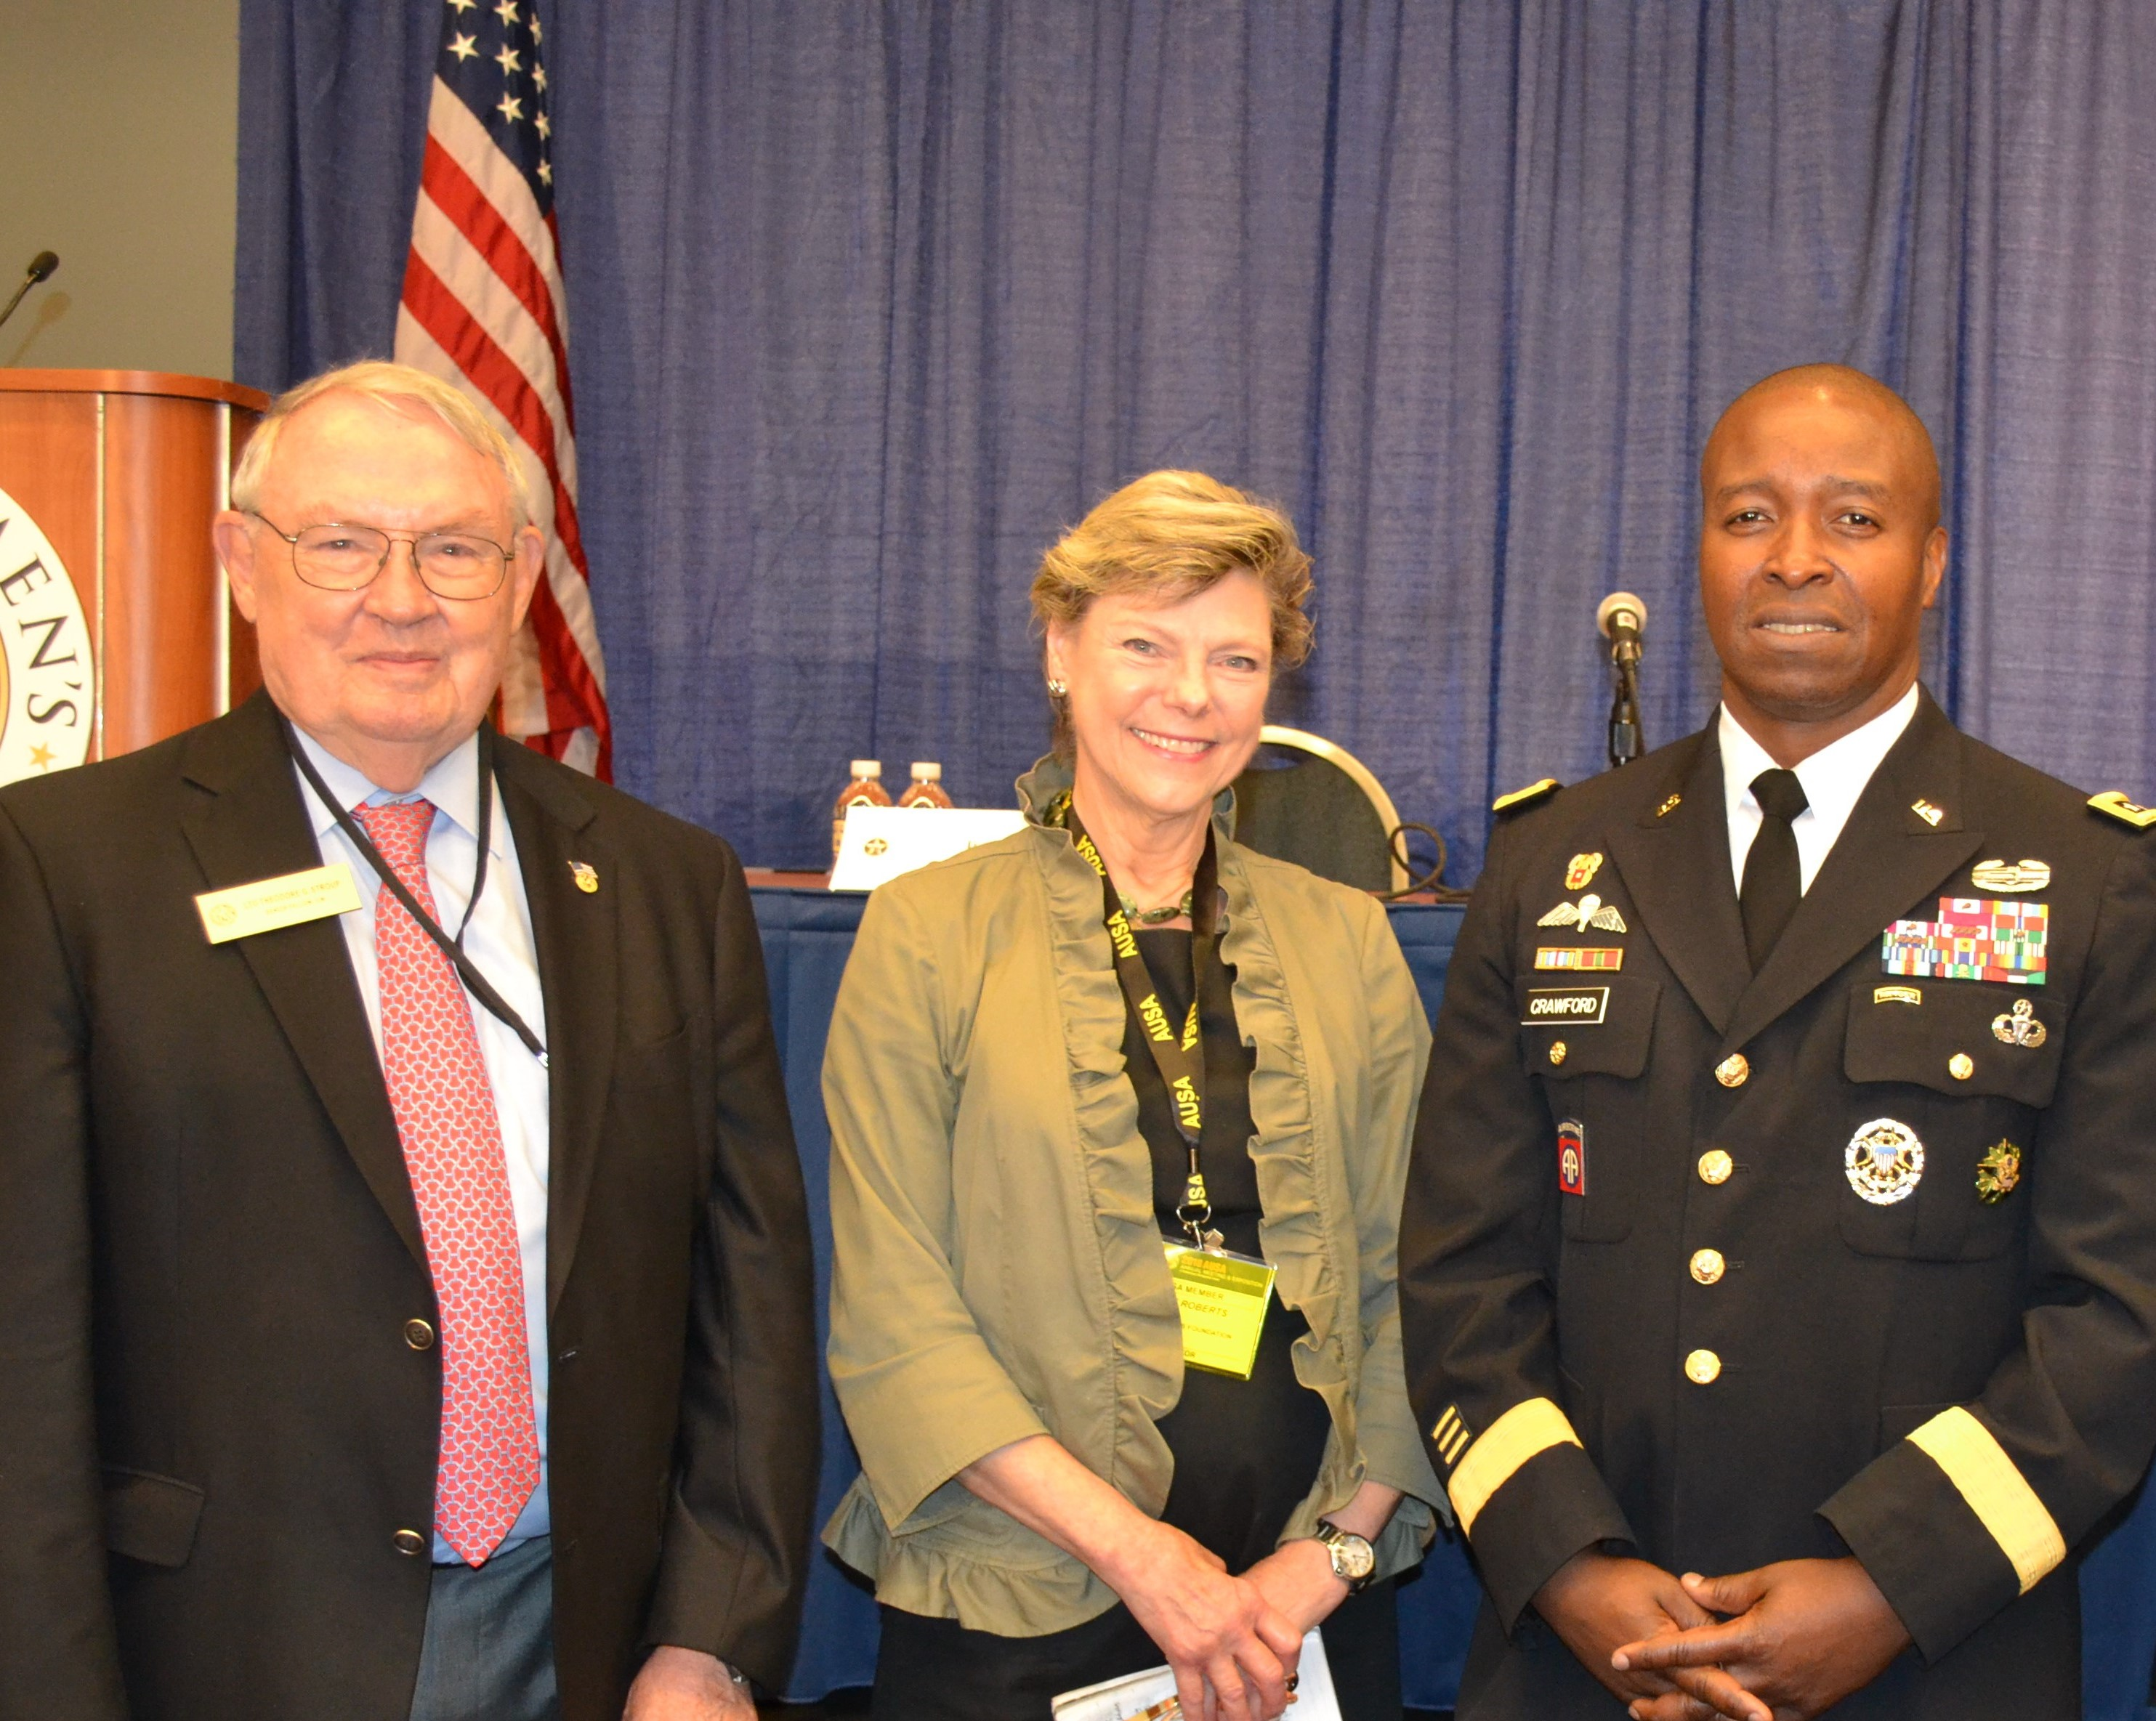 Cokie Roberts Headlines at U.S. Army Women's Foundation Program